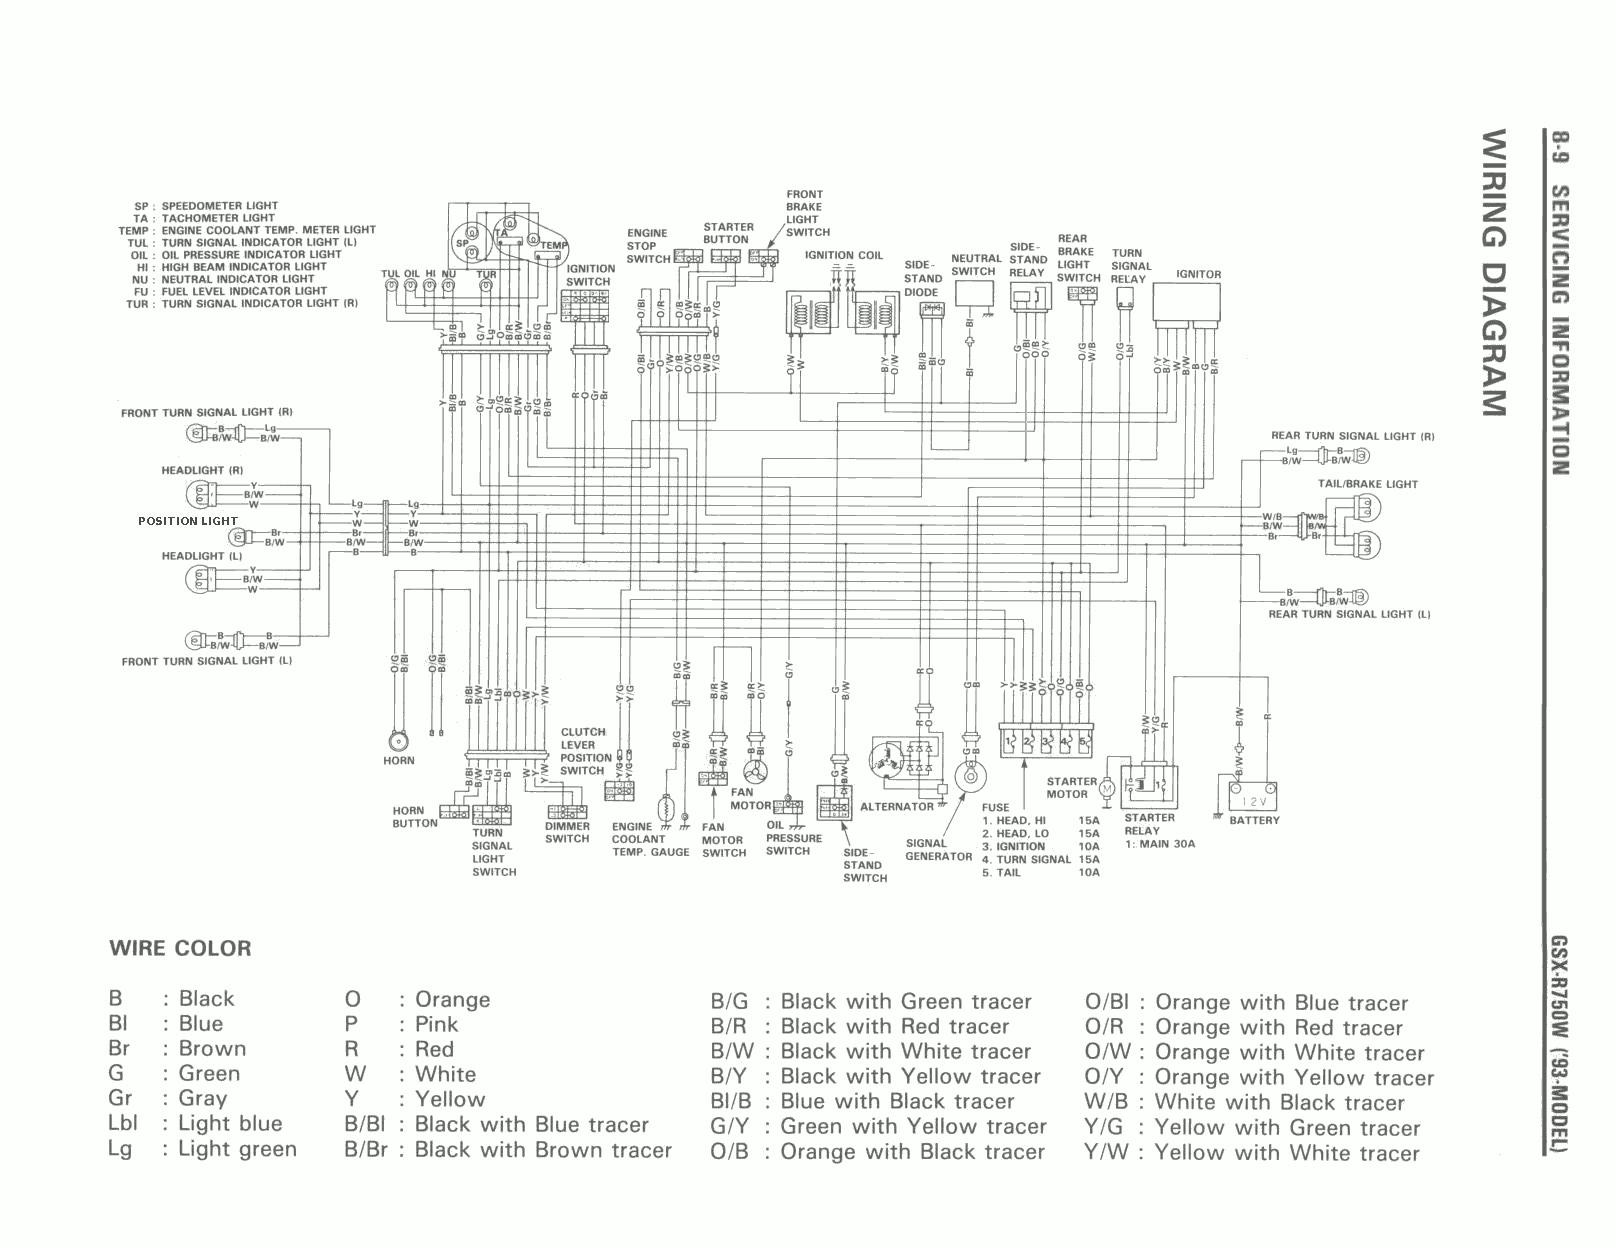 87 lt250r wiring diagram best electrical circuit wiring dr250s wiring diagram noro 32711502 3 phase ac motor wiring diagram #13